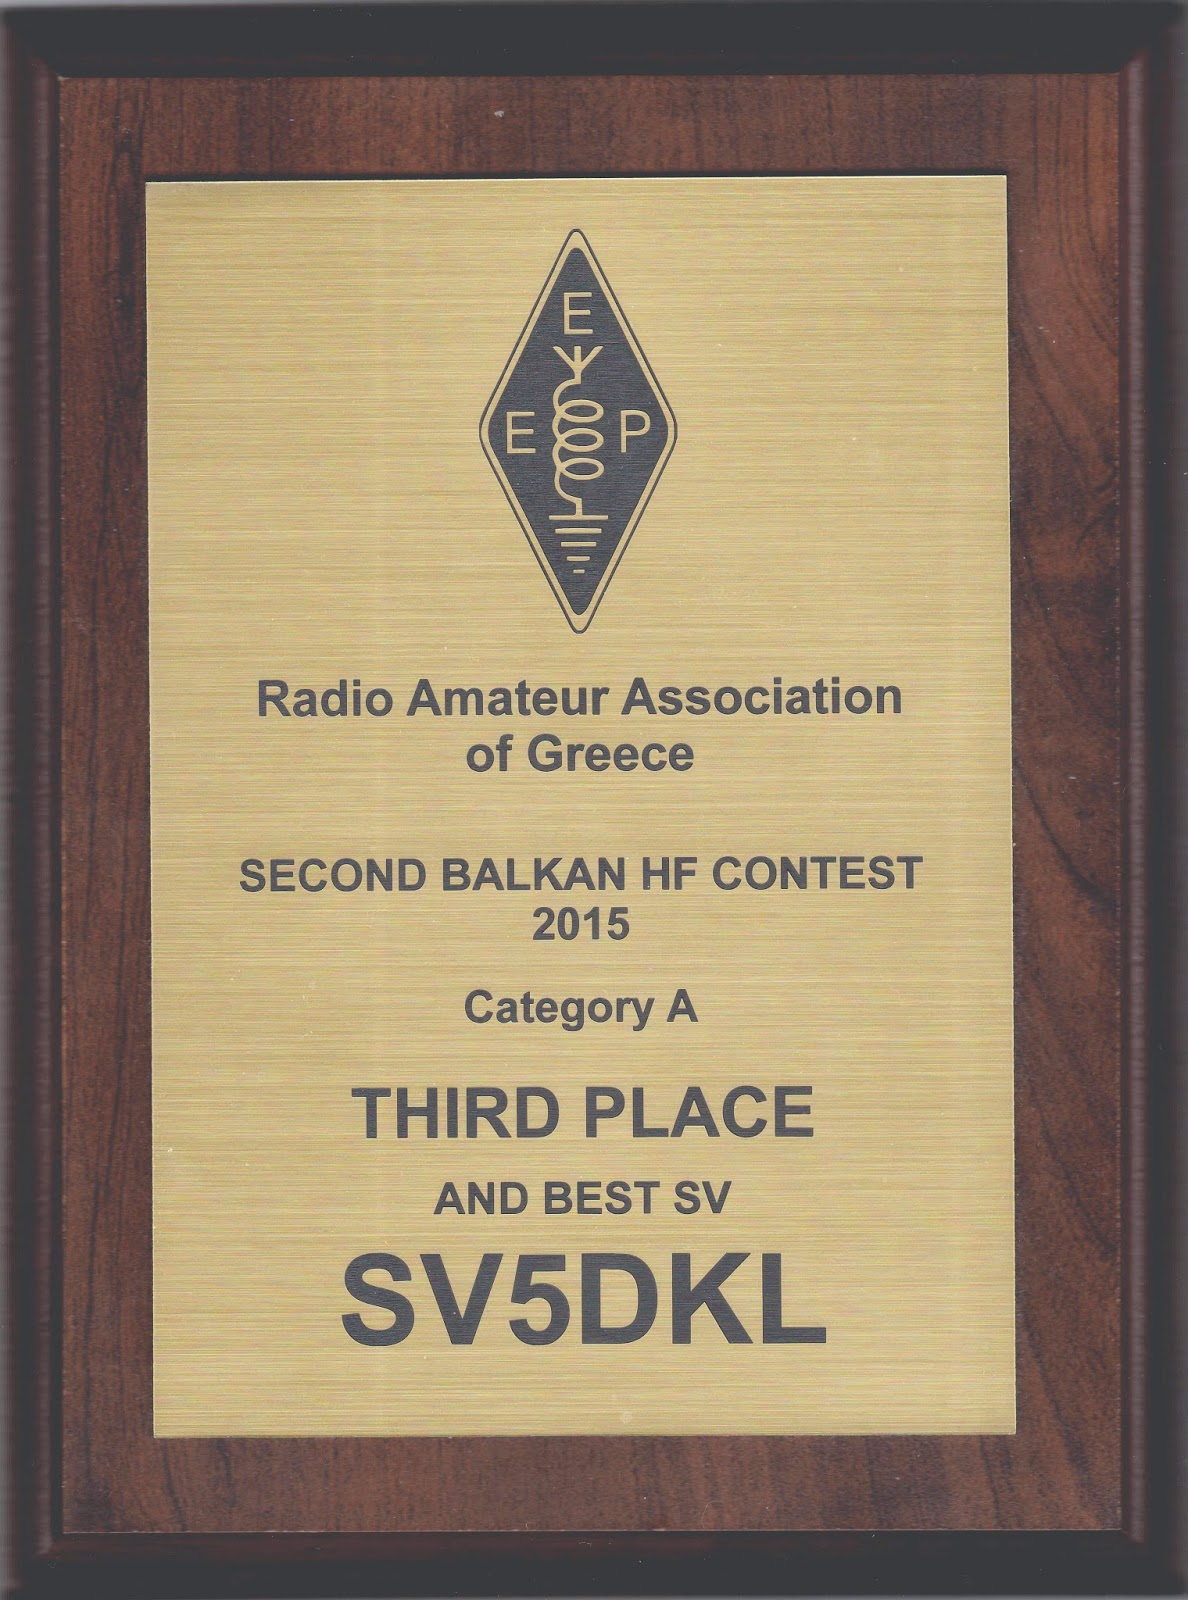 SV5DKL Amateur Radio Blog: My Trophies